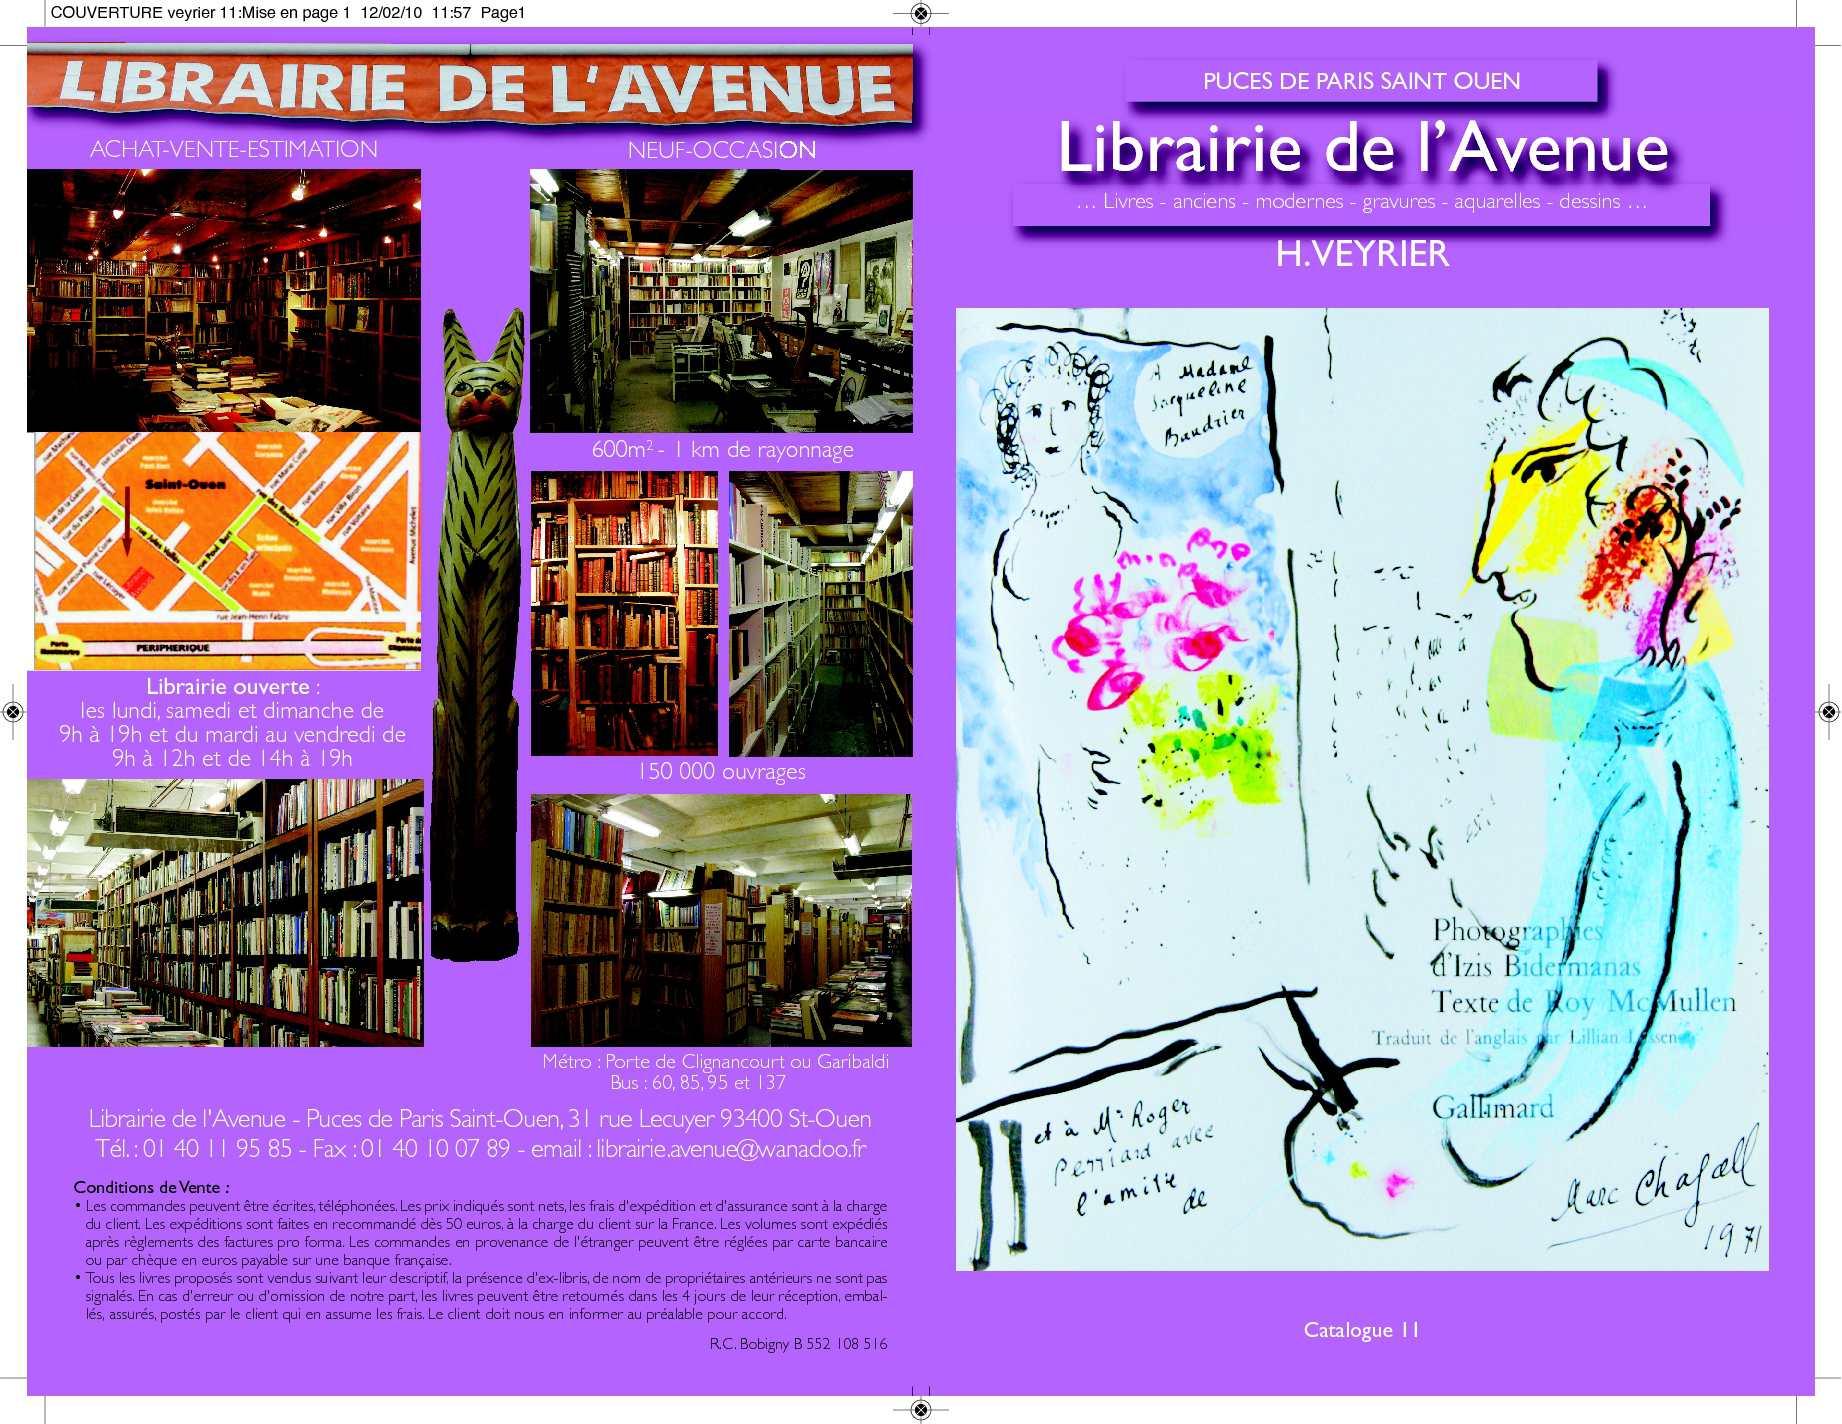 Calam o catalogue n 11 librairie de l 39 avenue - 30 avenue de la porte de clignancourt ...